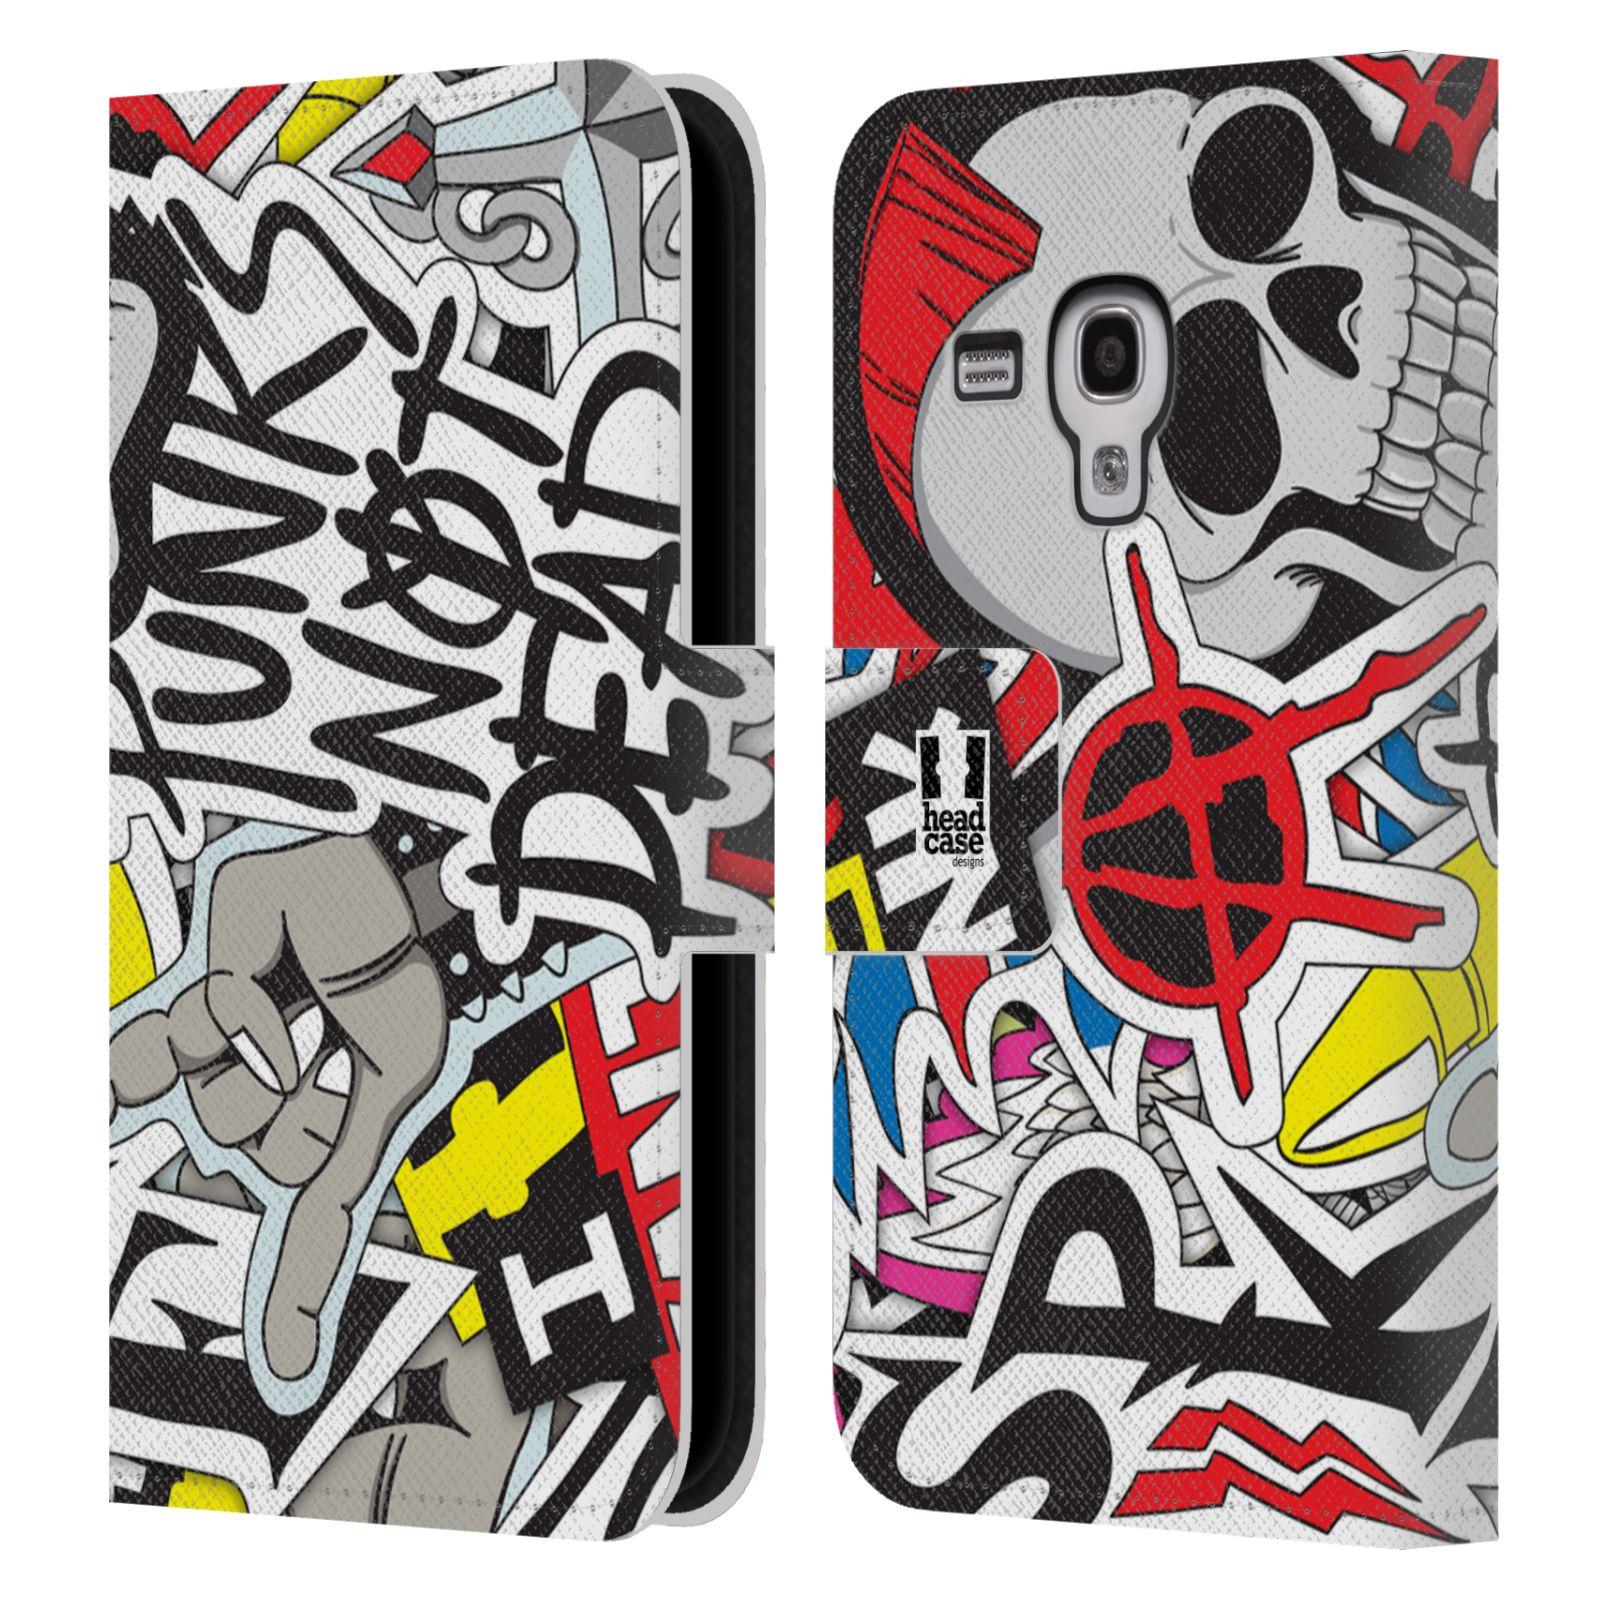 HEAD CASE Flipové pouzdro pro mobil Samsung Galaxy S3 MINI vzor STICKER nálepky PUNK IS NOT DEAD